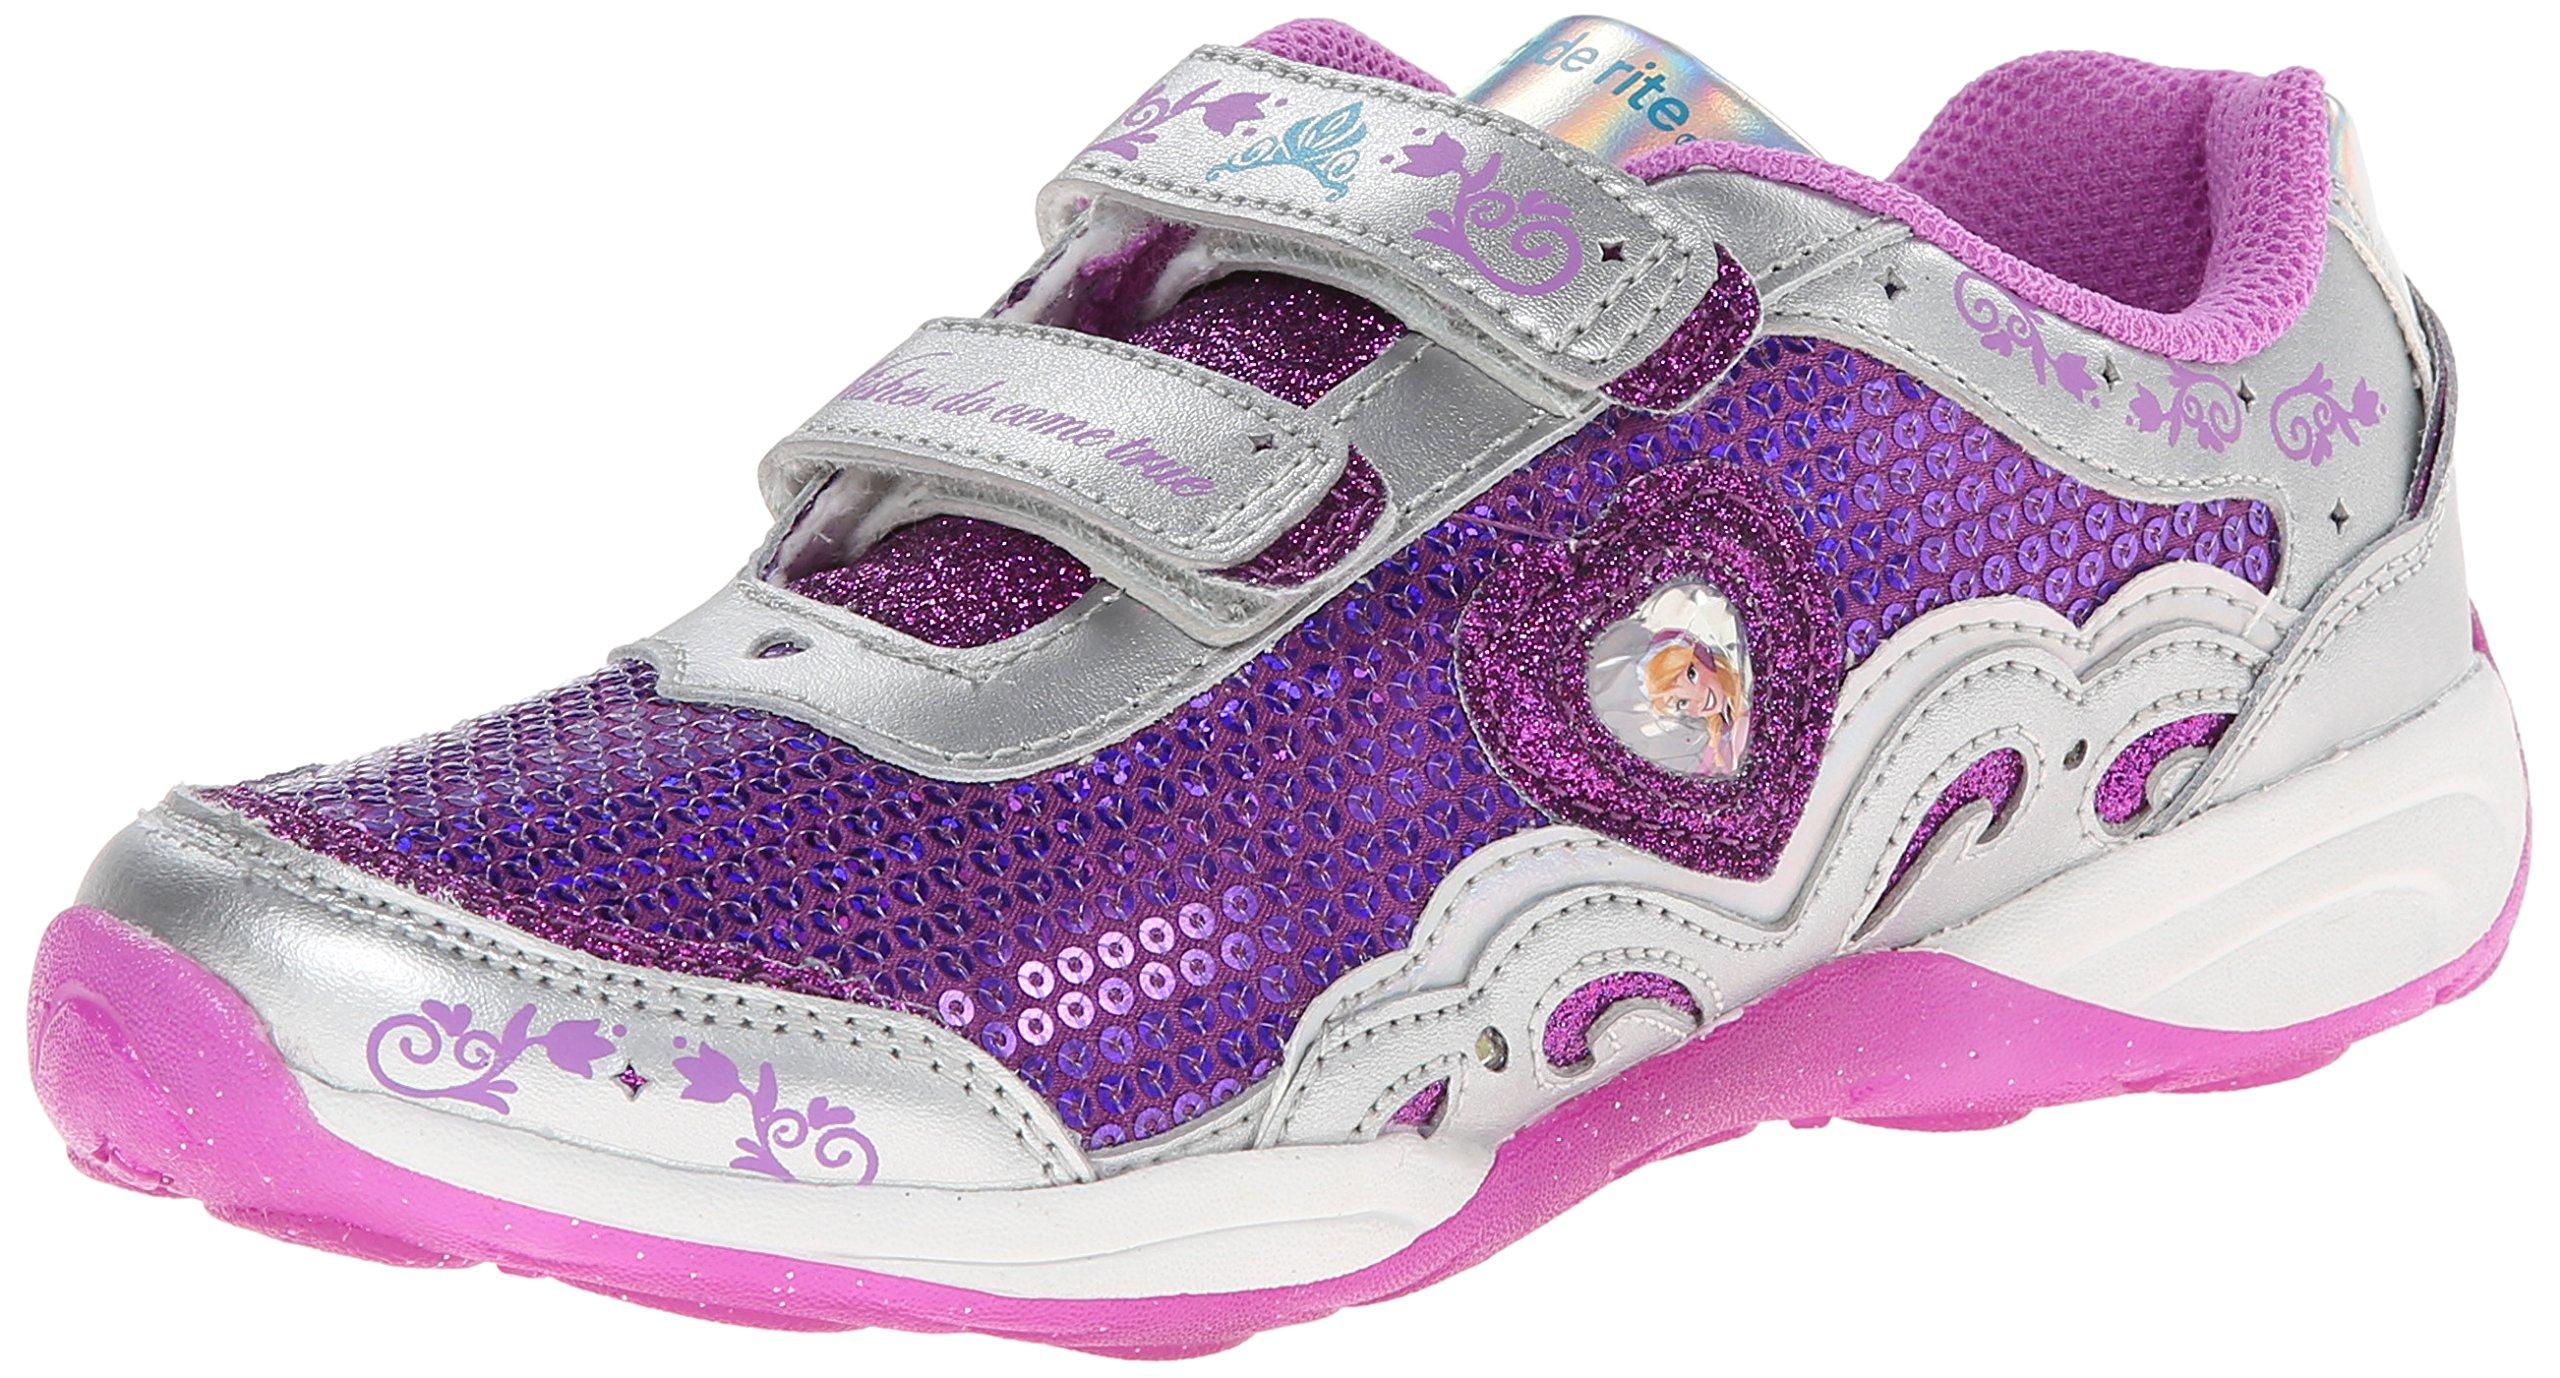 Stride Rite Disney Frozen Anna and Elsa Light-Up Sneaker (Toddler/Little Kid)